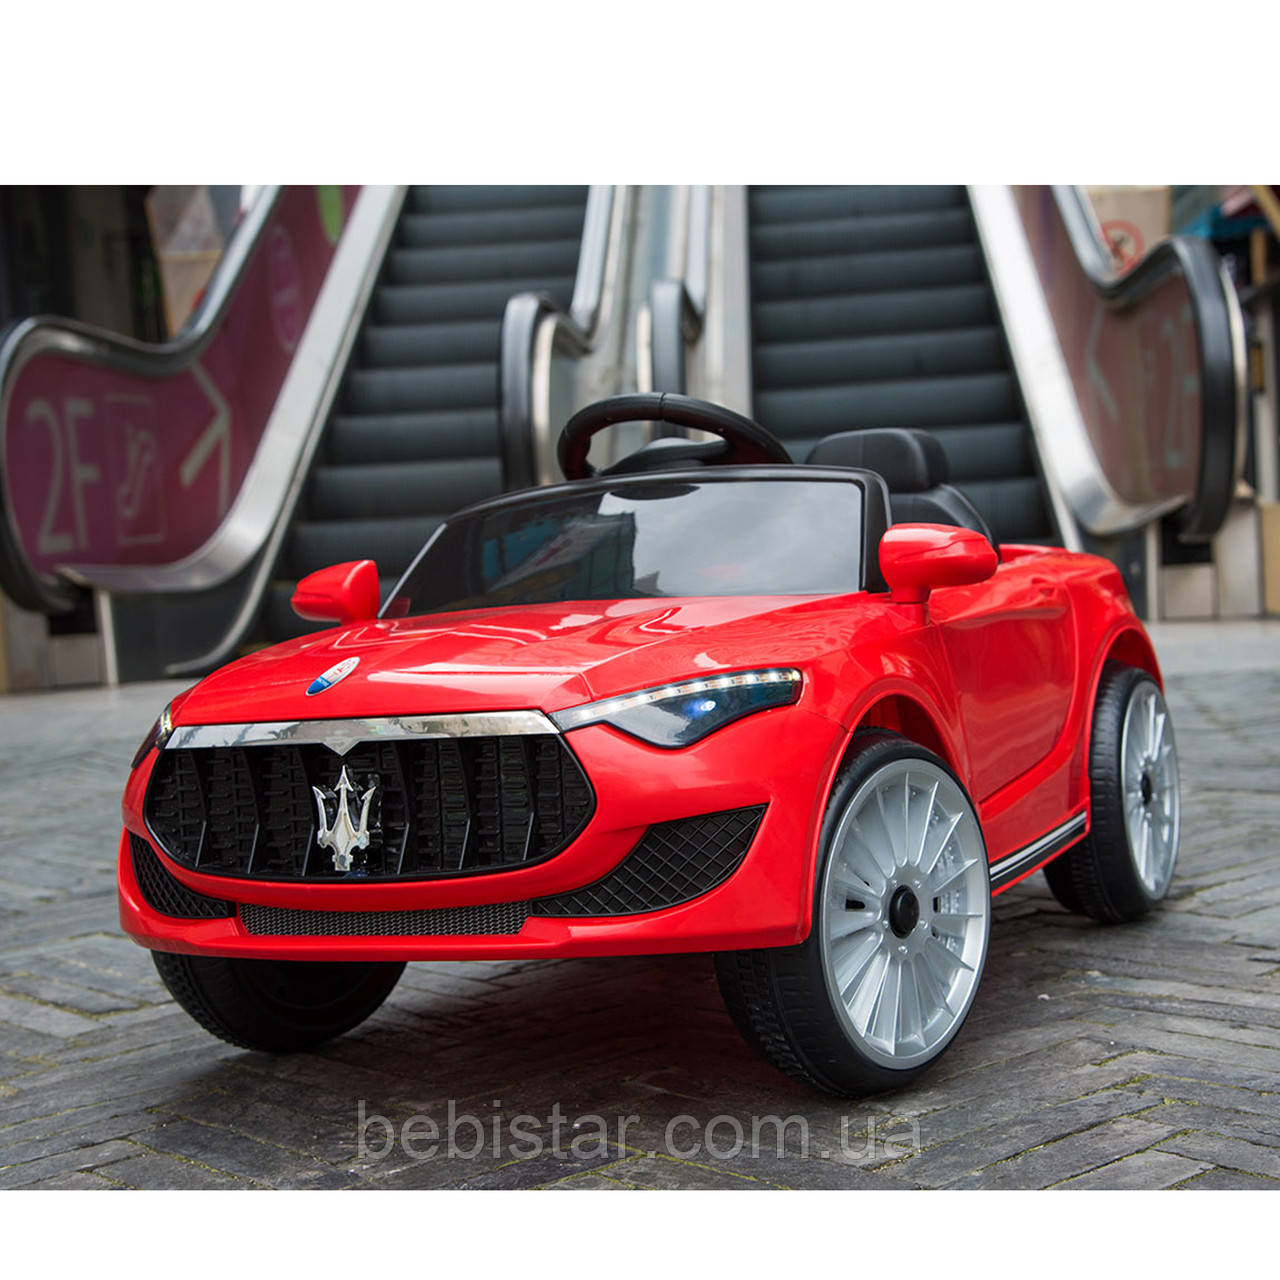 Электромобиль спорткар T-7628 RED для деток 3-8 лет с пультом мотор 2*20W с MP3